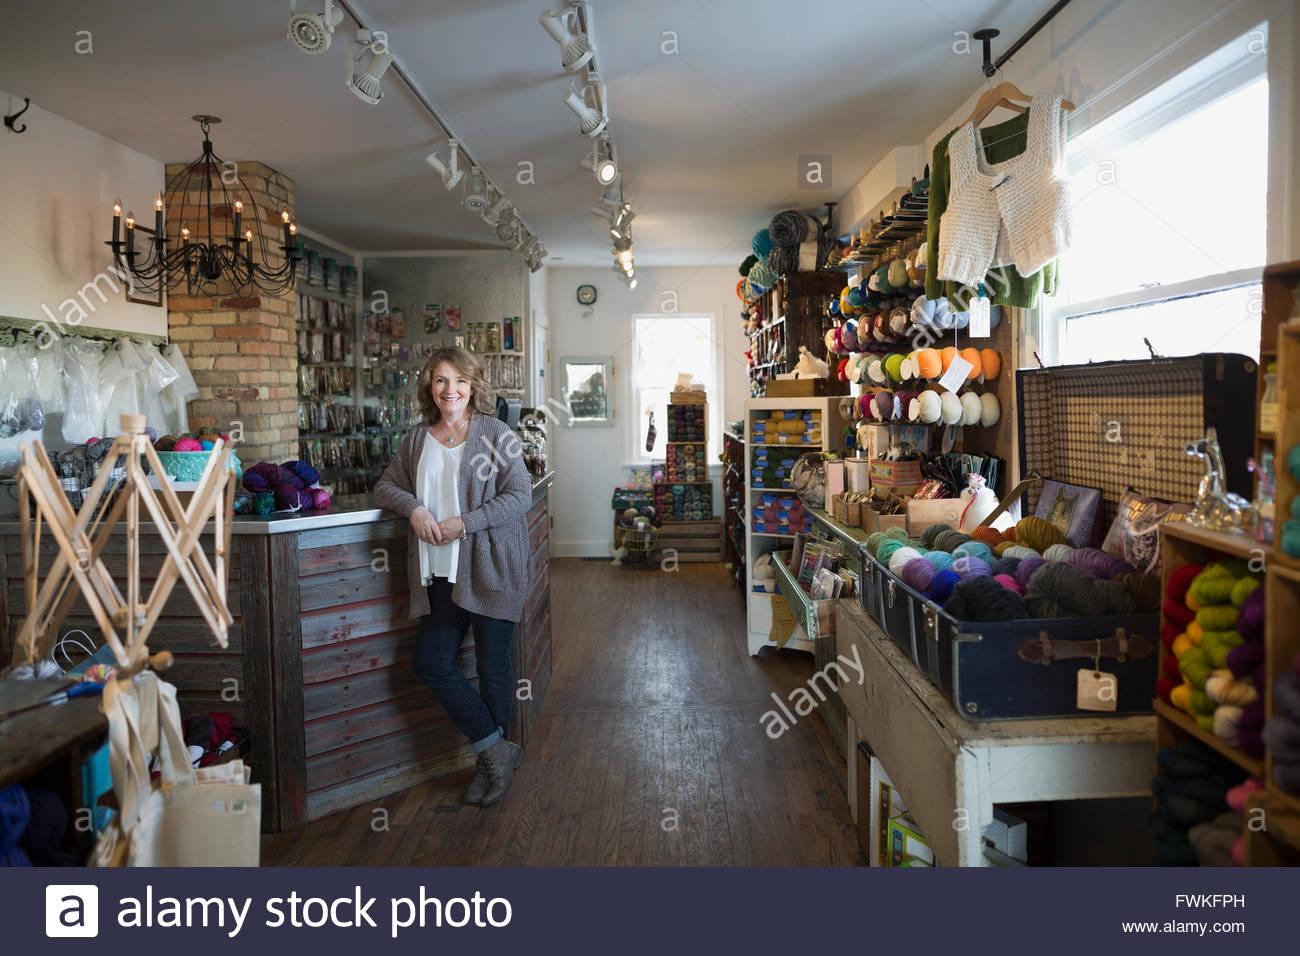 Portrait confiant magasin propriétaire leaning on counter Photo Stock